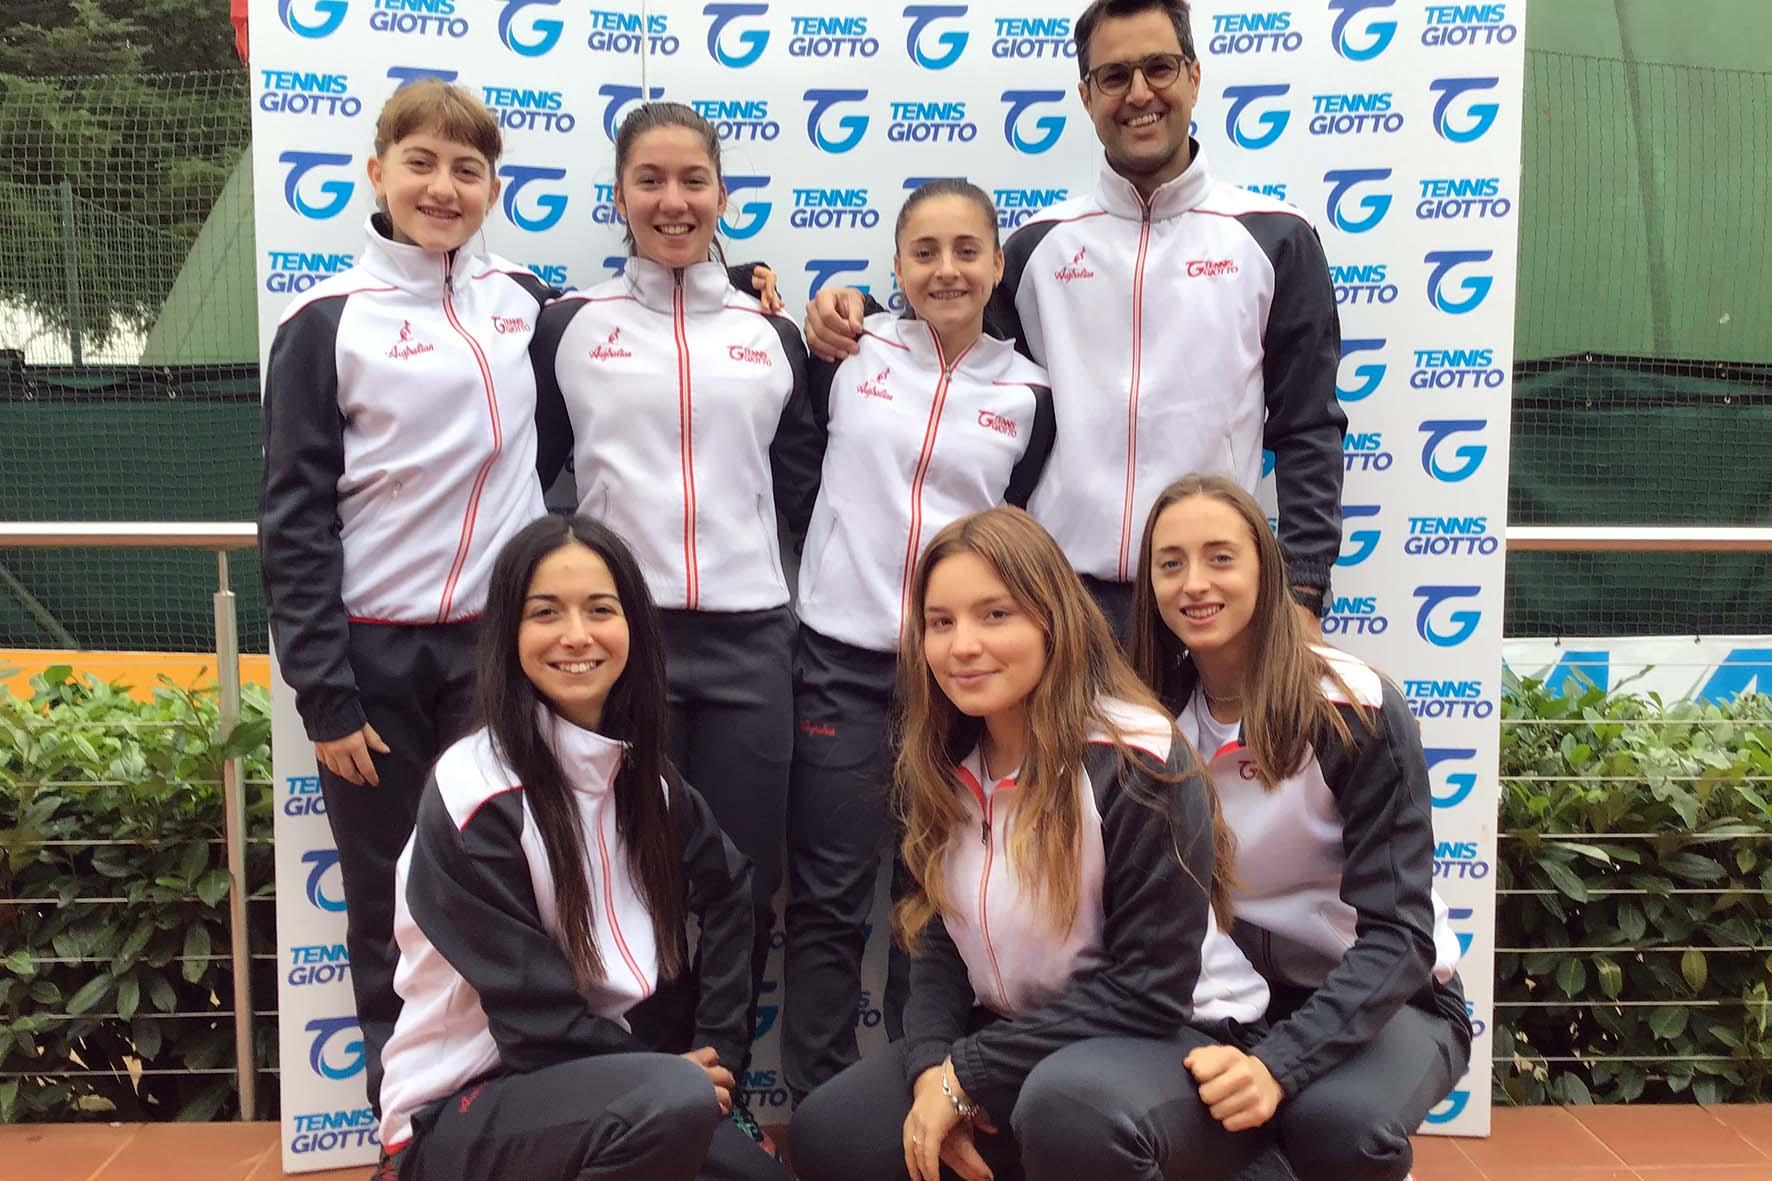 Tennis Giotto - Serie C femminile 2020